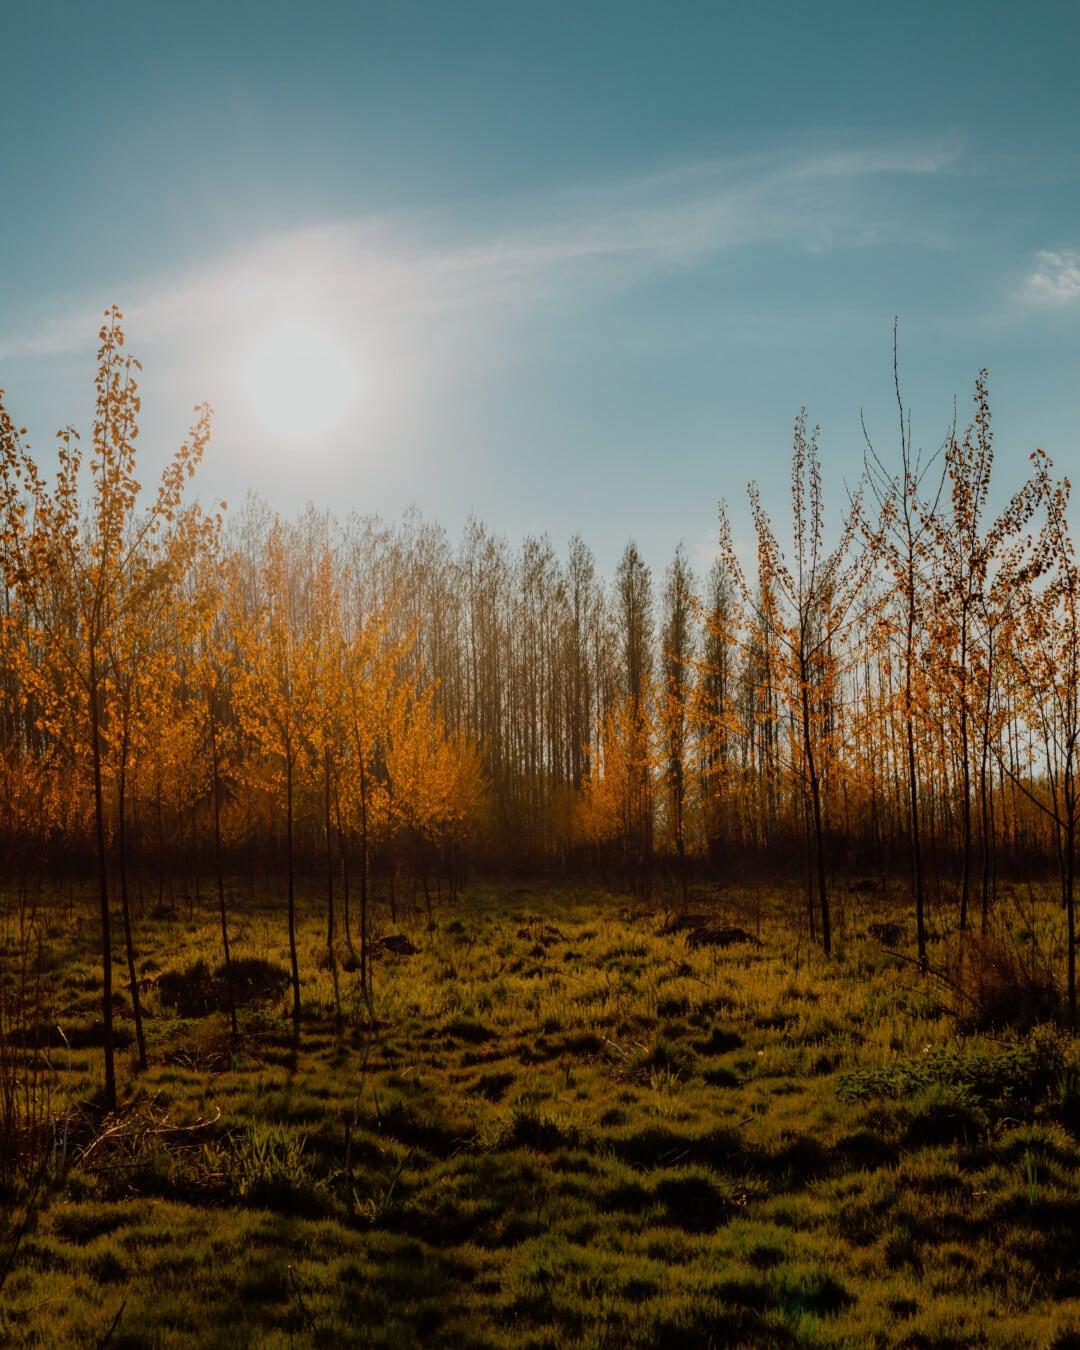 sunshine, sun, sunrays, autumn season, forest, majestic, atmosphere, calm, dawn, nature